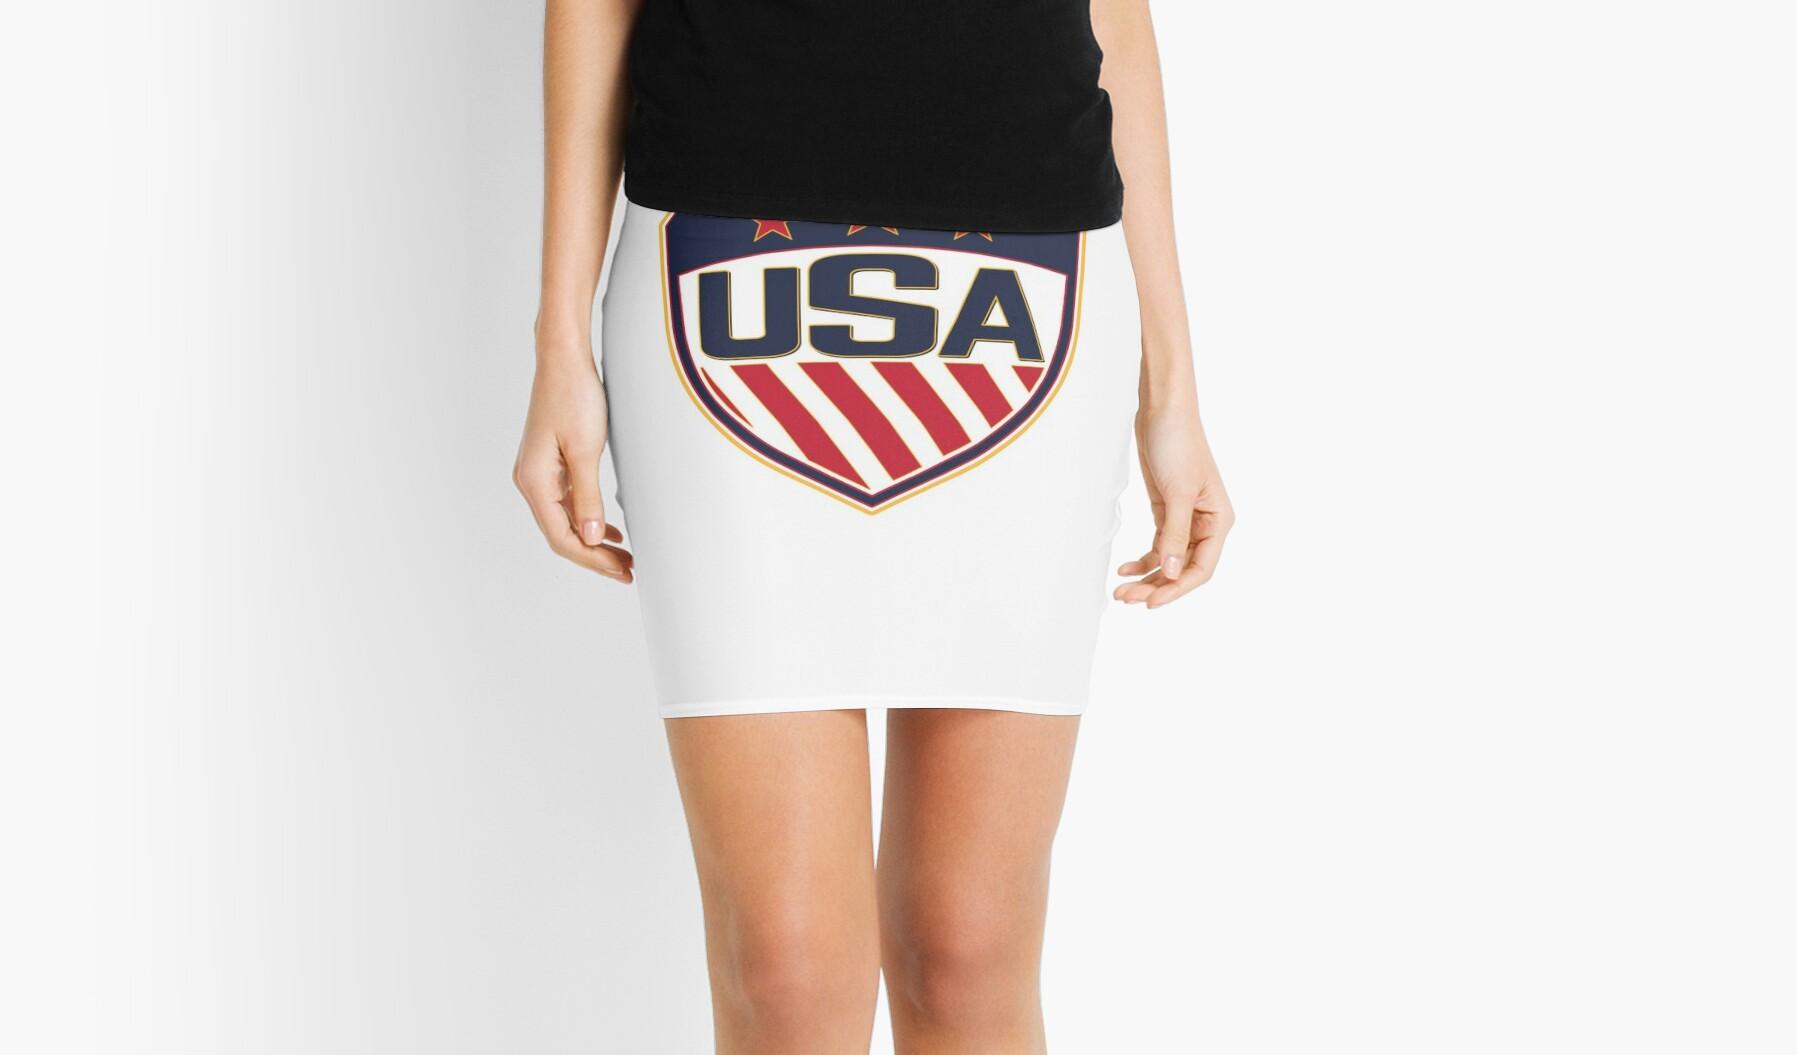 b531f00f7 USA National Ice Hockey Jersey Uniform number 10